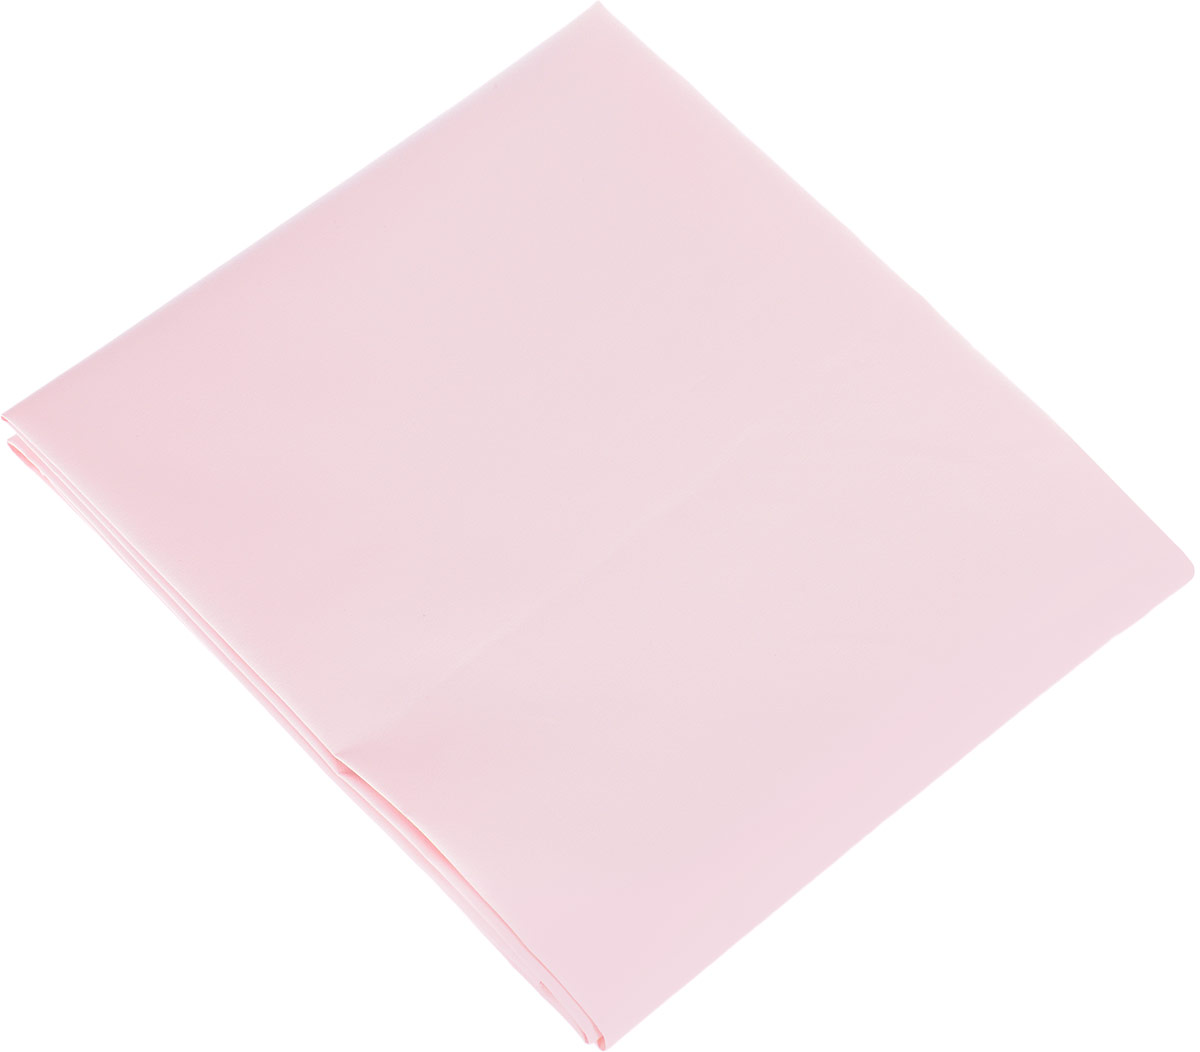 Пелигрин Наматрасник детский цвет розовый 120 х 60 х 10 см наматрасники candide наматрасник водонепроницаемый waterproof fitted sheet 60x120 см